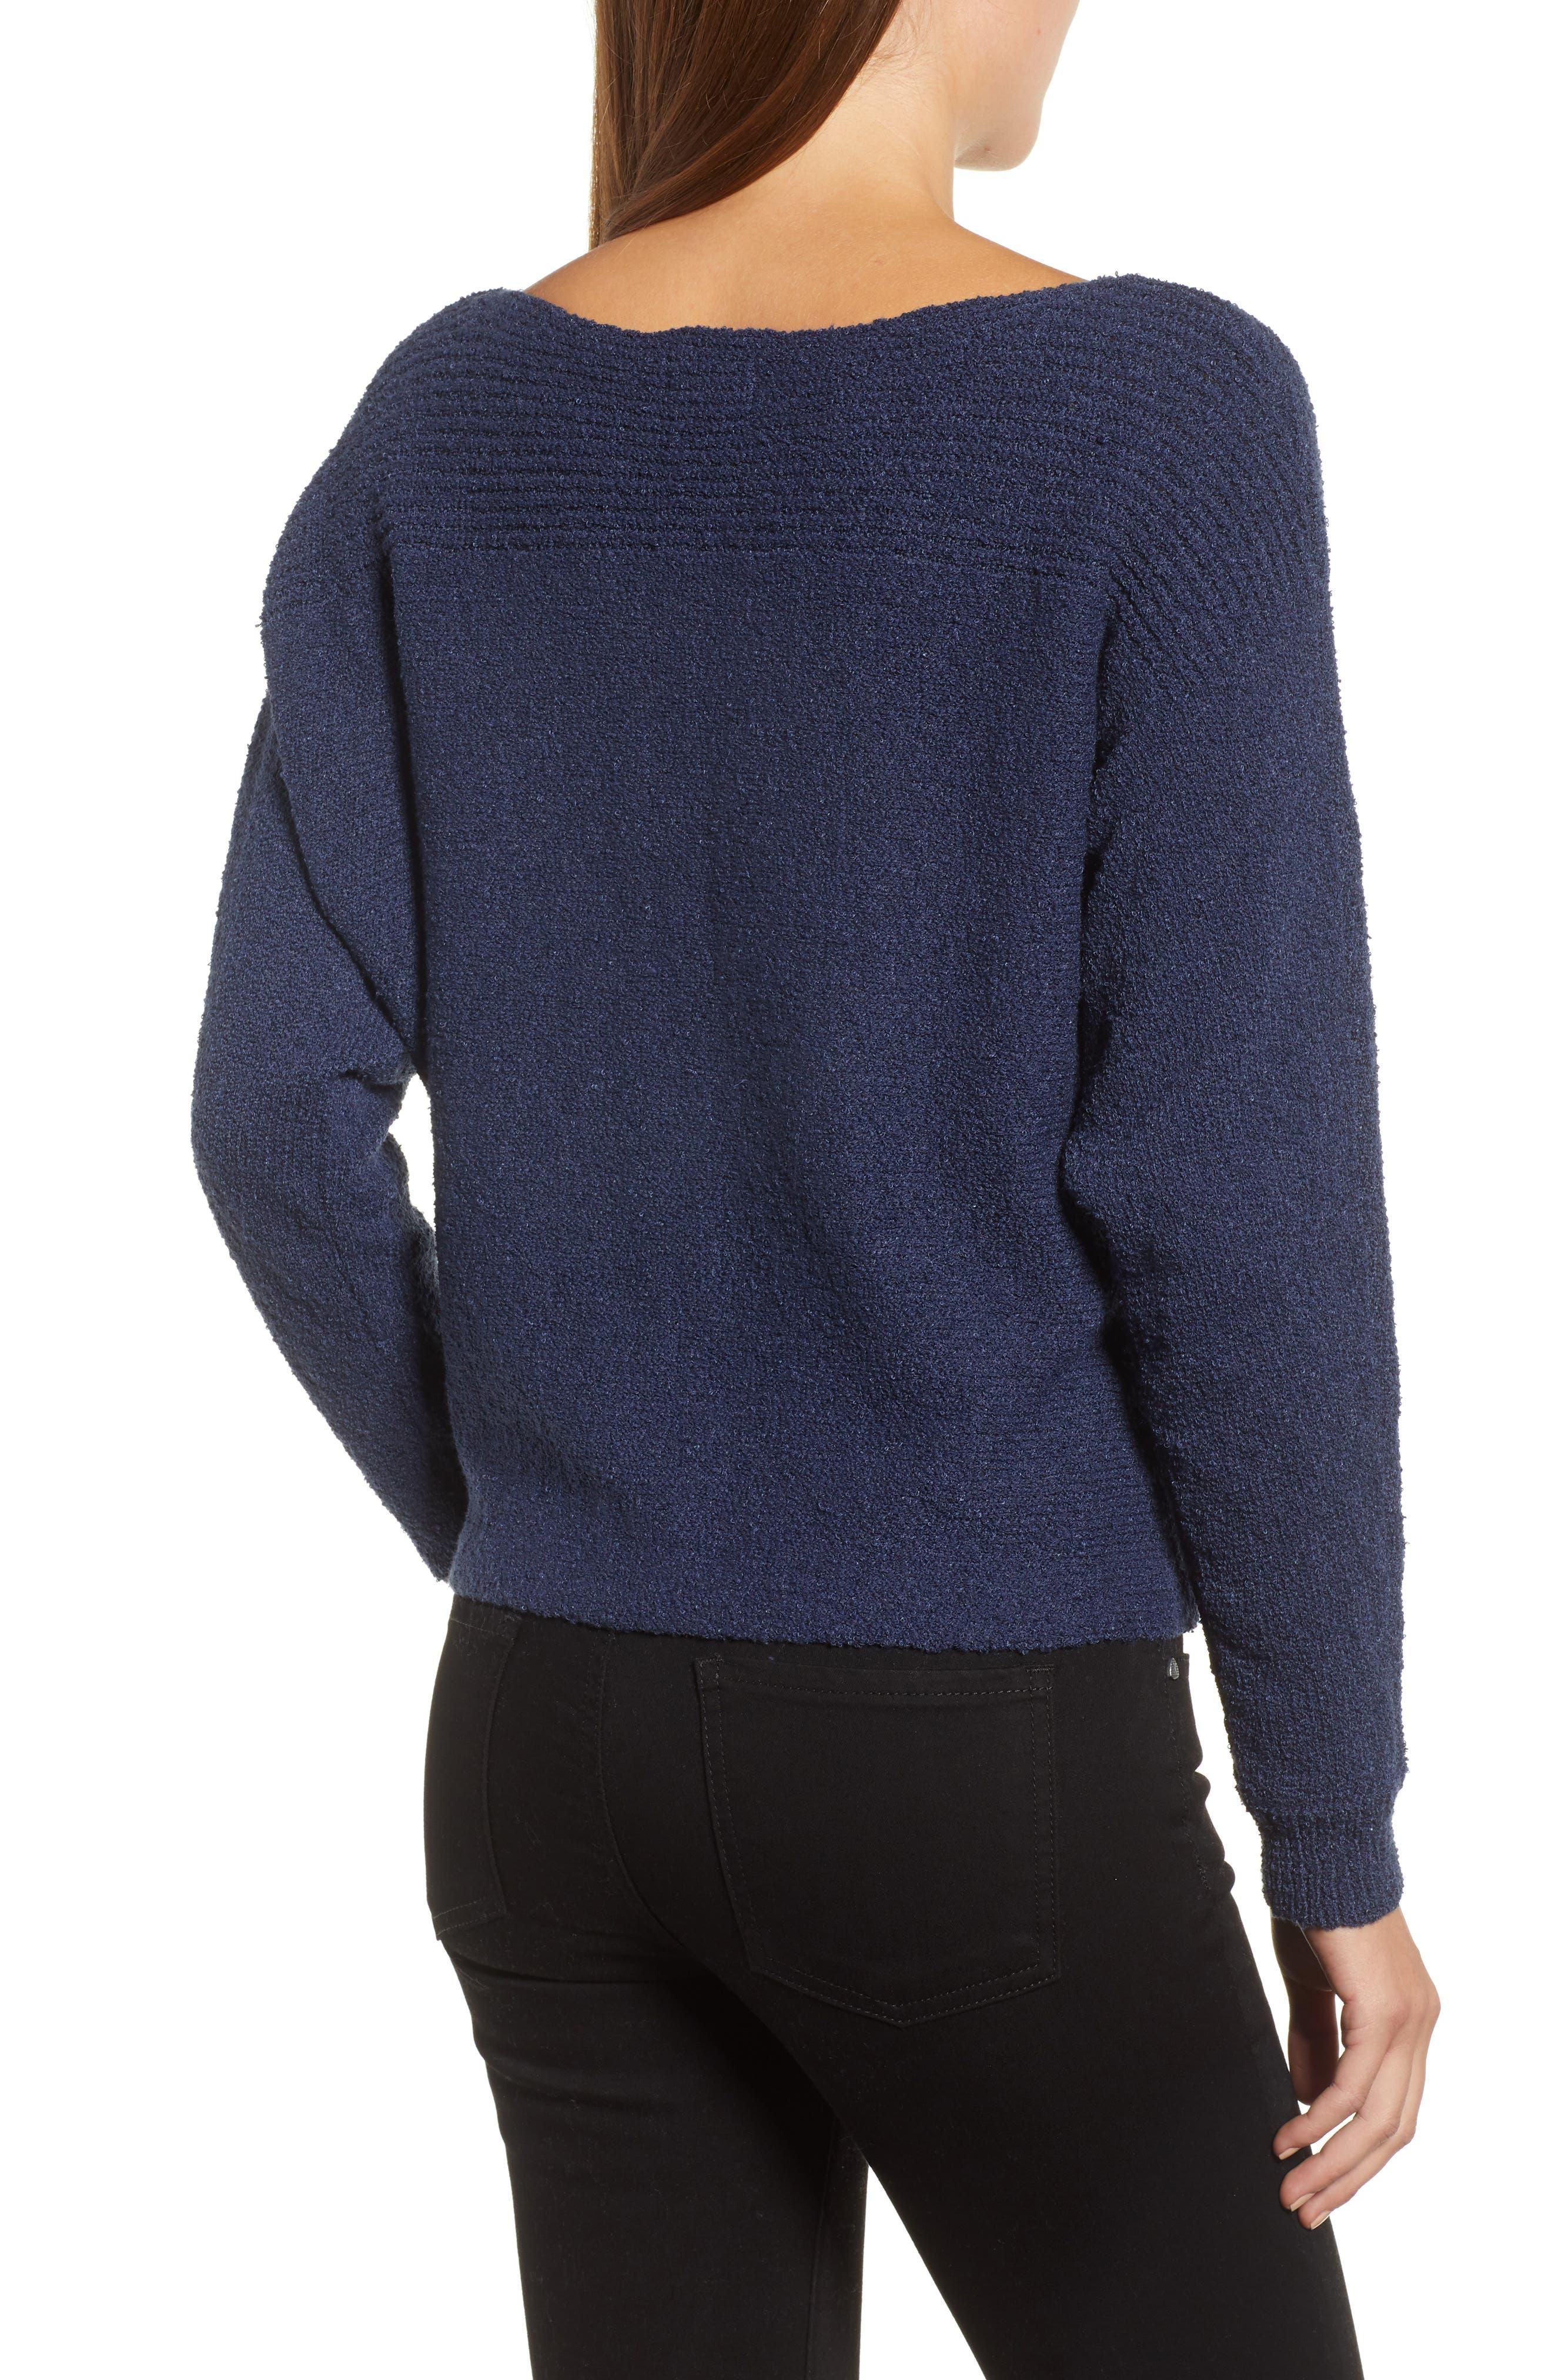 Calson<sup>®</sup> Dolman Sleeve Sweater,                             Alternate thumbnail 2, color,                             Navy Indigo